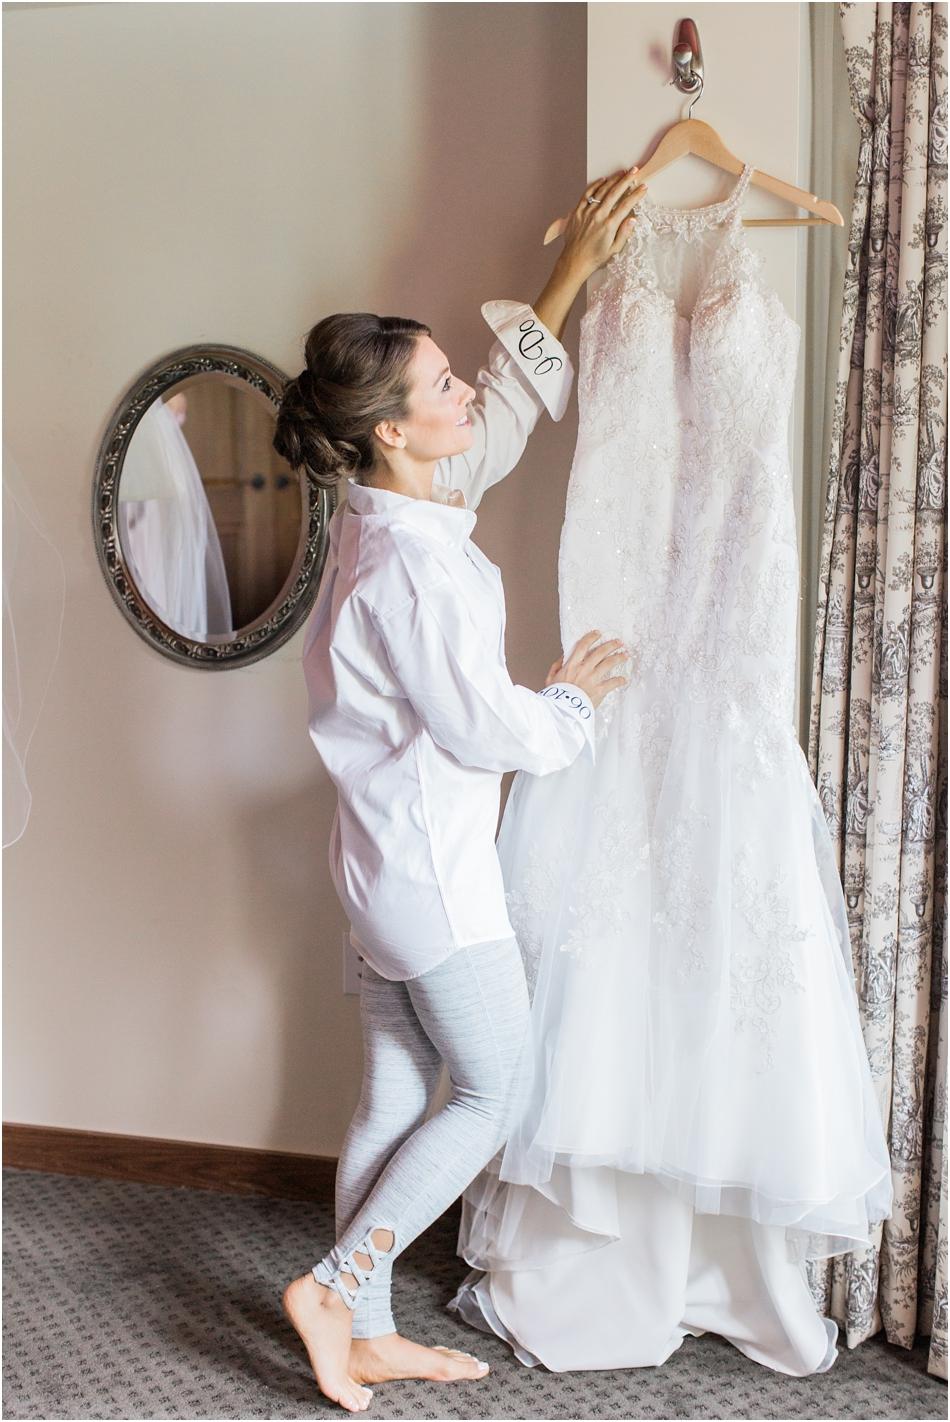 pine_hills_mirbeau_golf_club_boston_massachusetts_cape_cod_new_england_wedding_photographer_Meredith_Jane_Photography_photo_1680.jpg